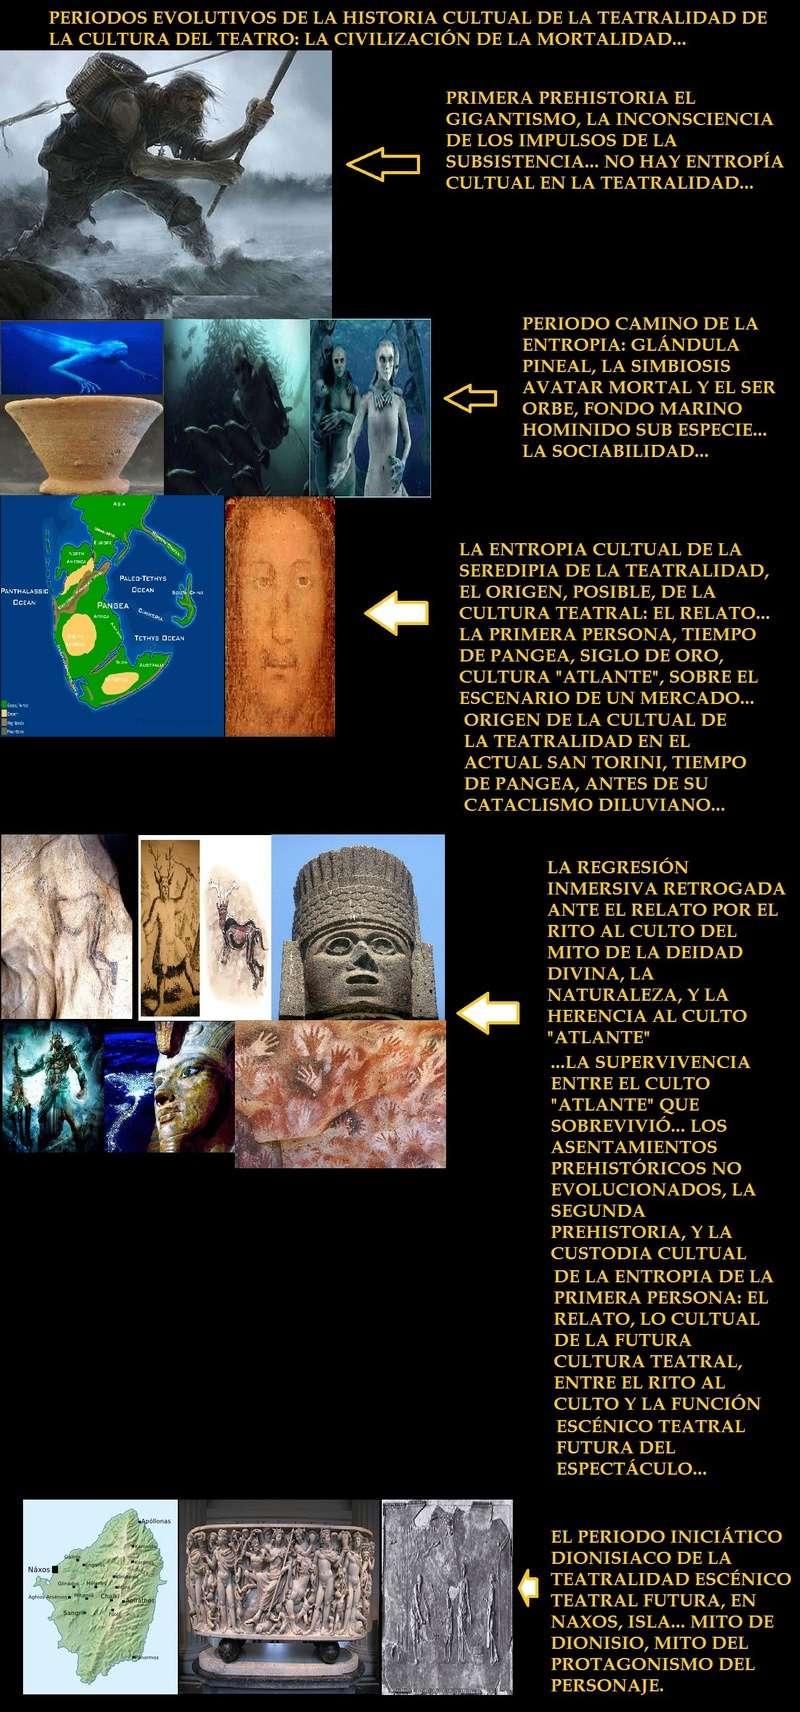 ¿ESTA ES LA CRONOLOGÍA EVOLUTIVA CULTUAL DE LA CULTURA TEATRAL? Gigant10